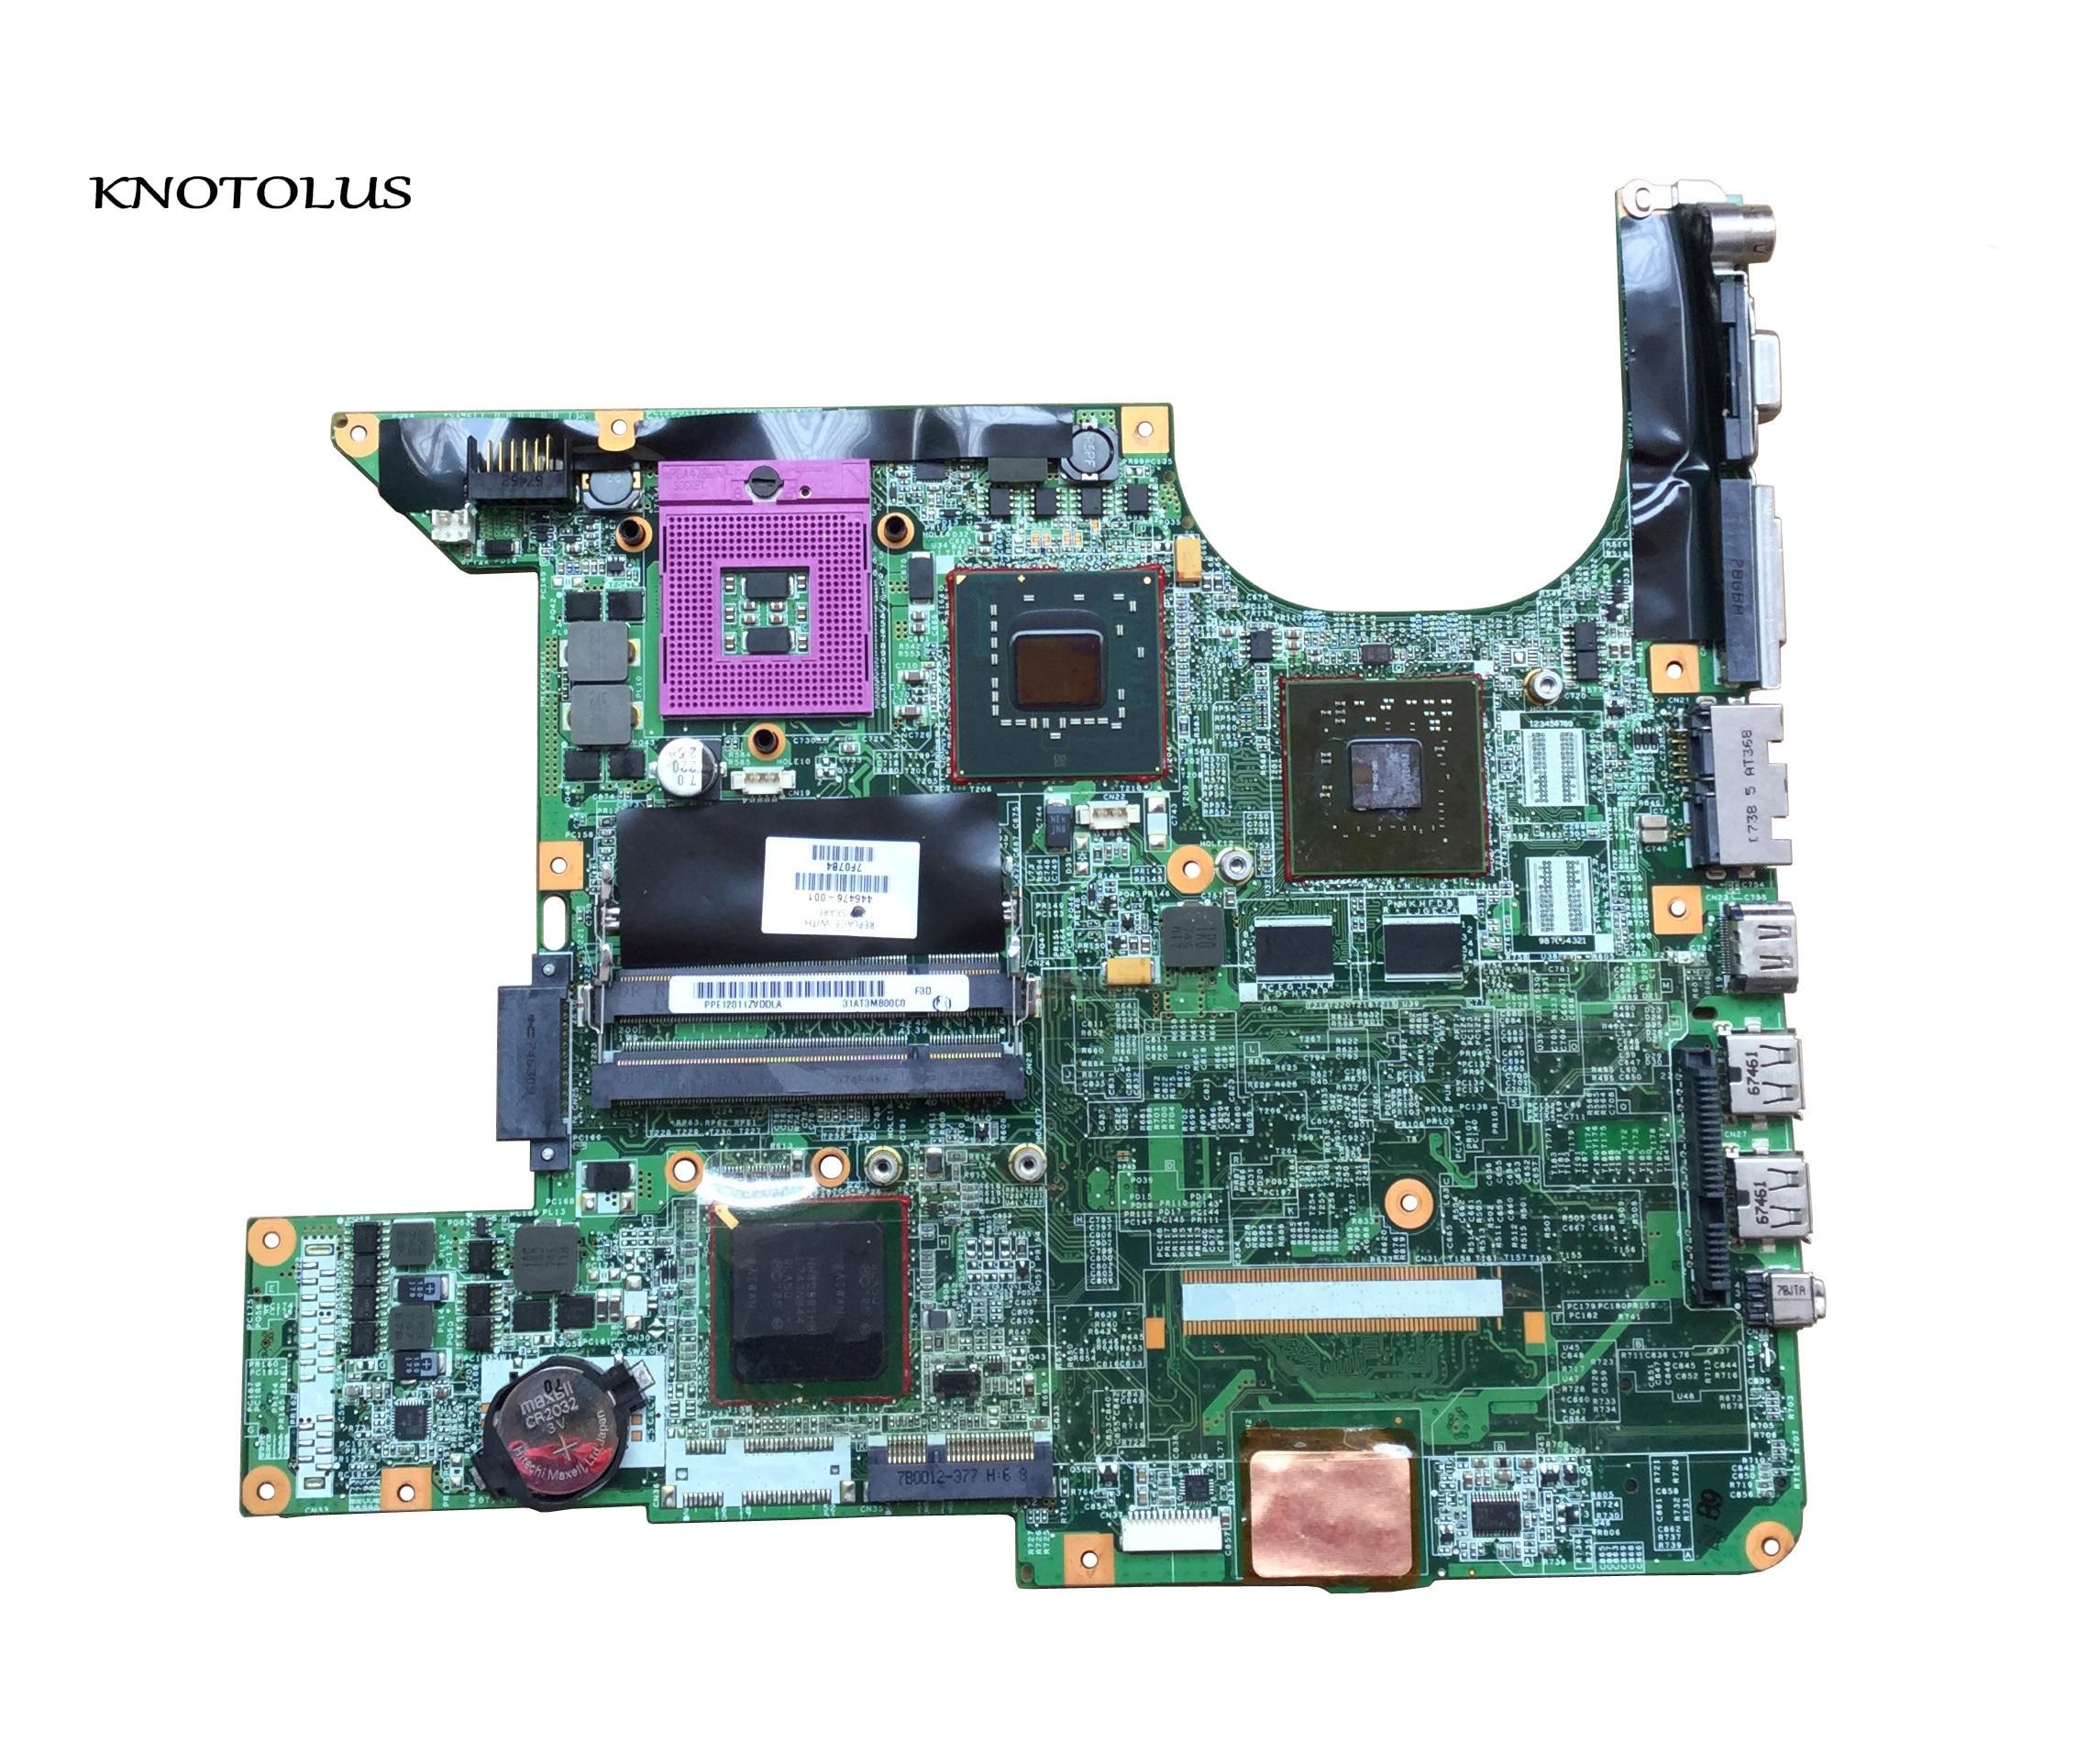 446476-001 Free Shipping For HP PAVILION DV6000 DV6500 DV6700 DV6800 Motherboard PM965 Chipset 100% Test Good